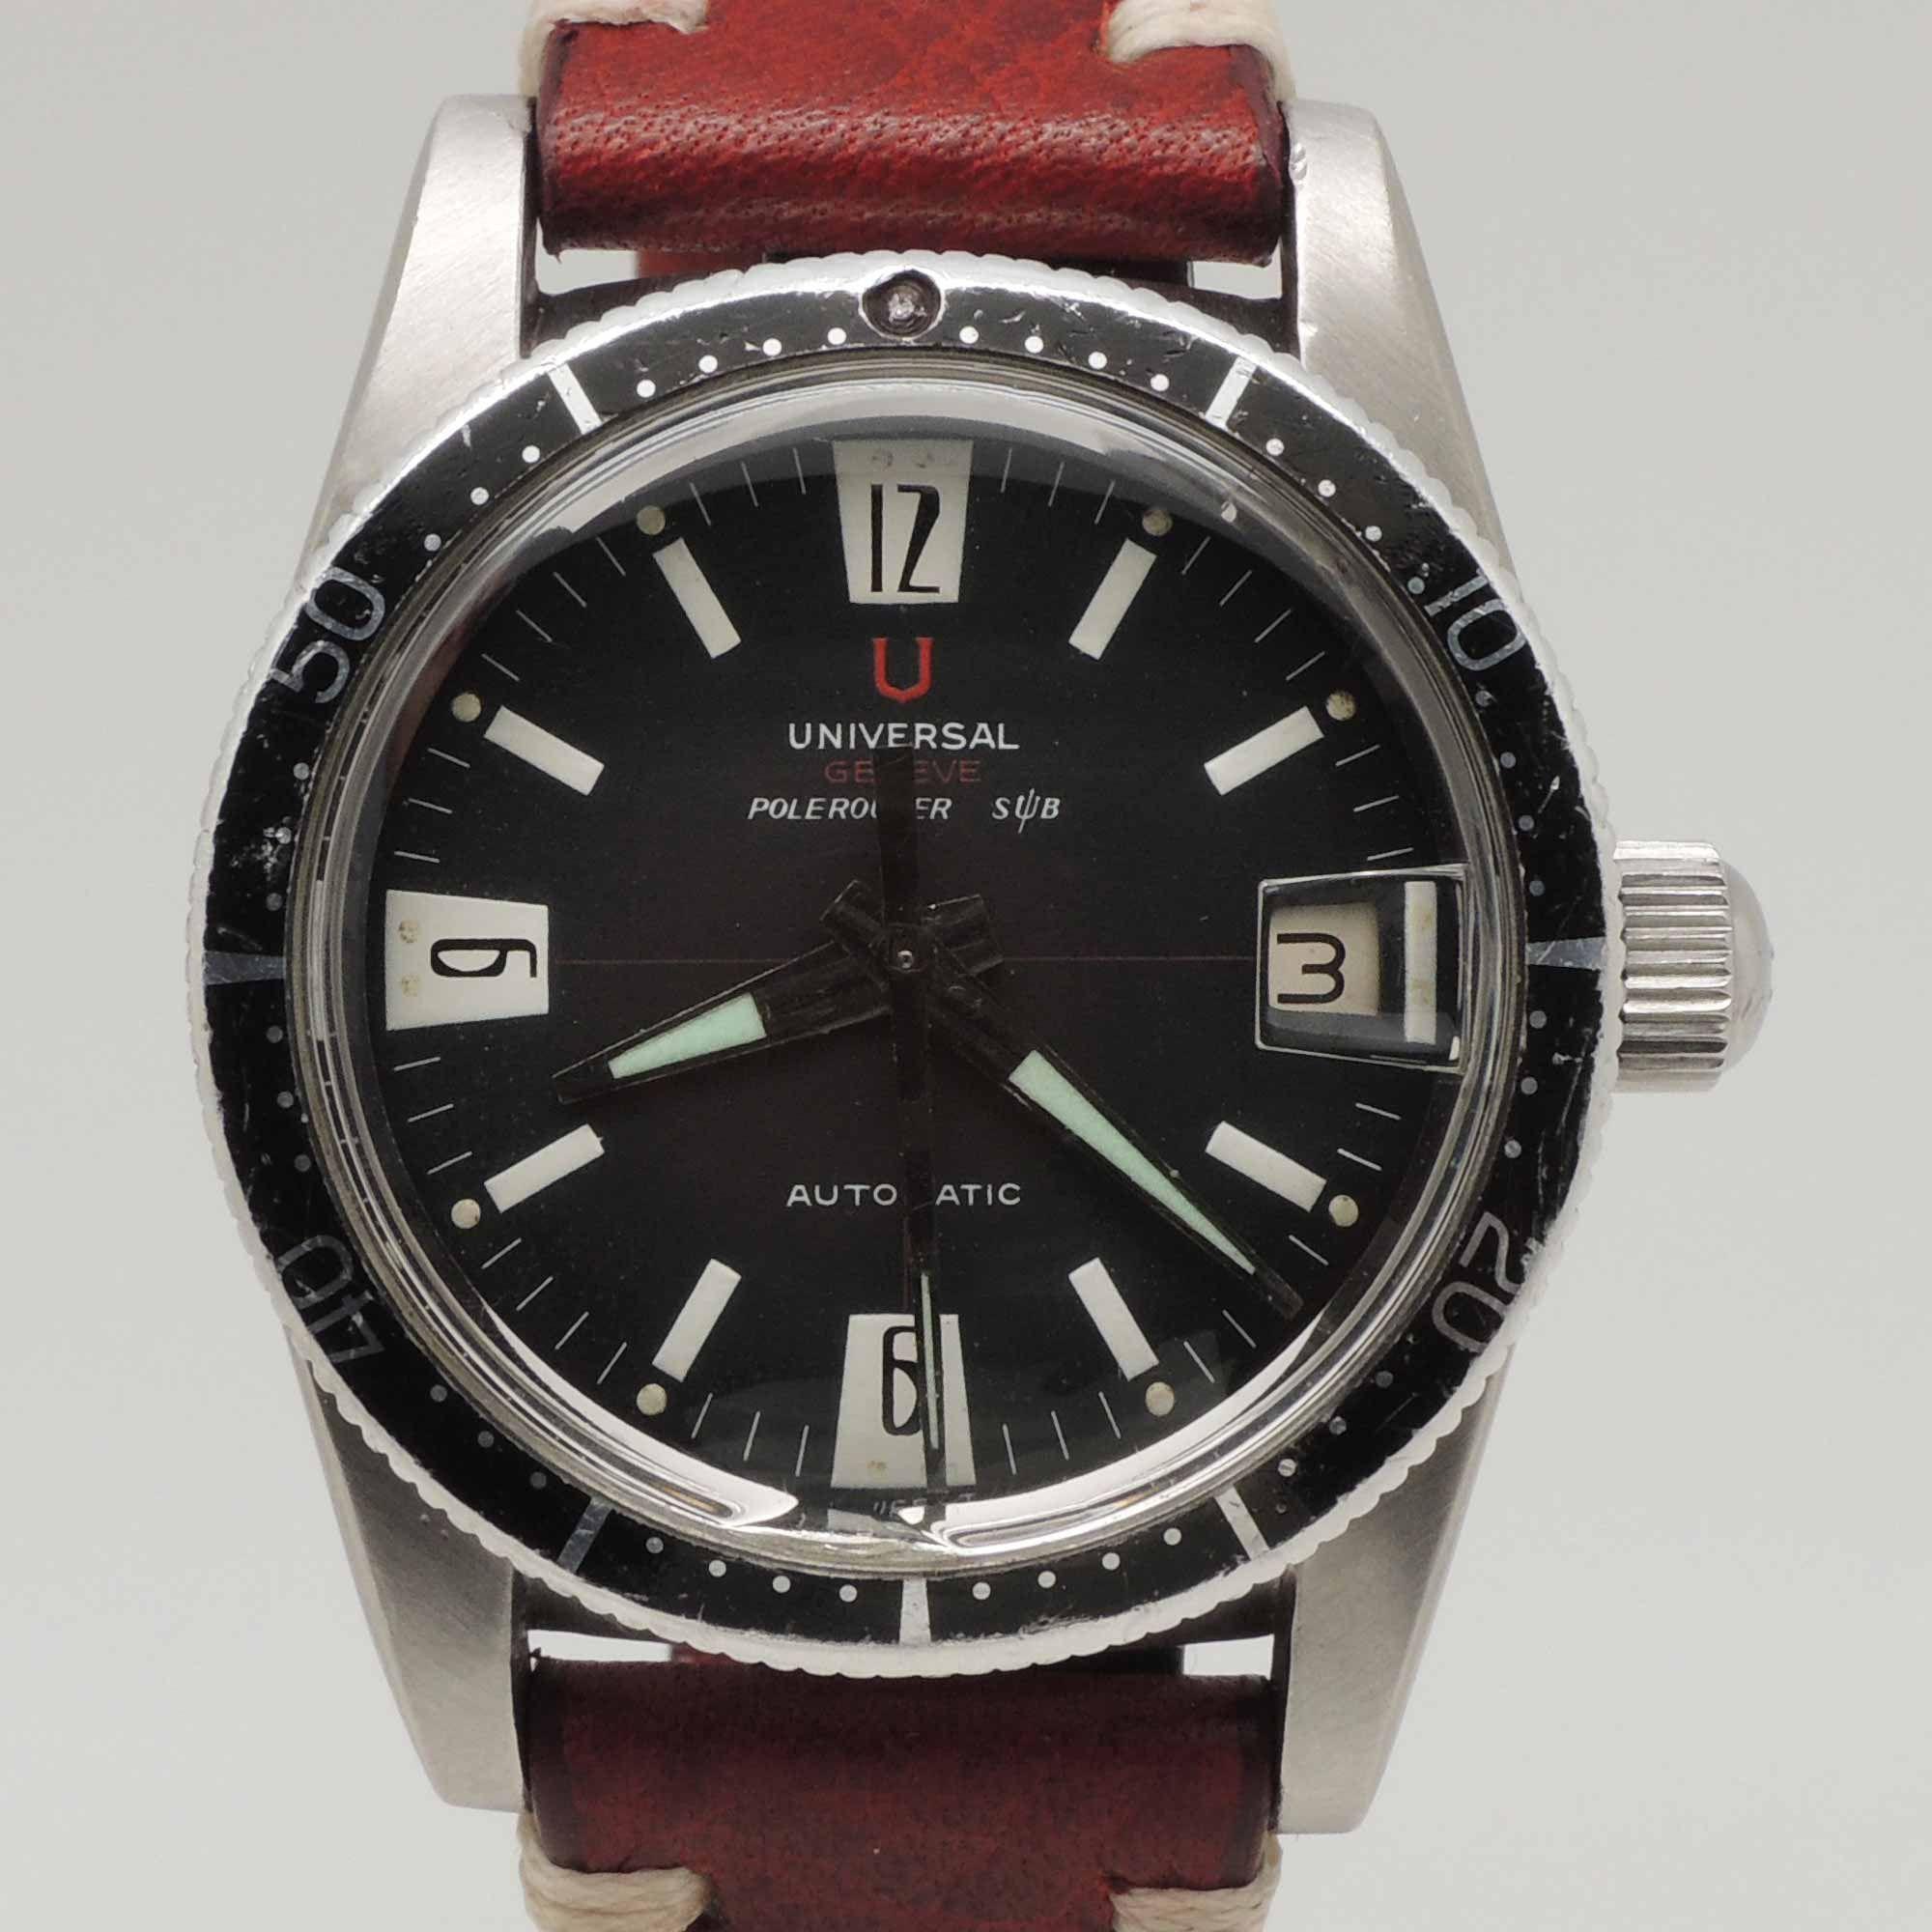 Universal Geneve Polerouter Sub Ref 869116 Venta De Relojes Reloj De Acero Inoxidable Reloj Vintage